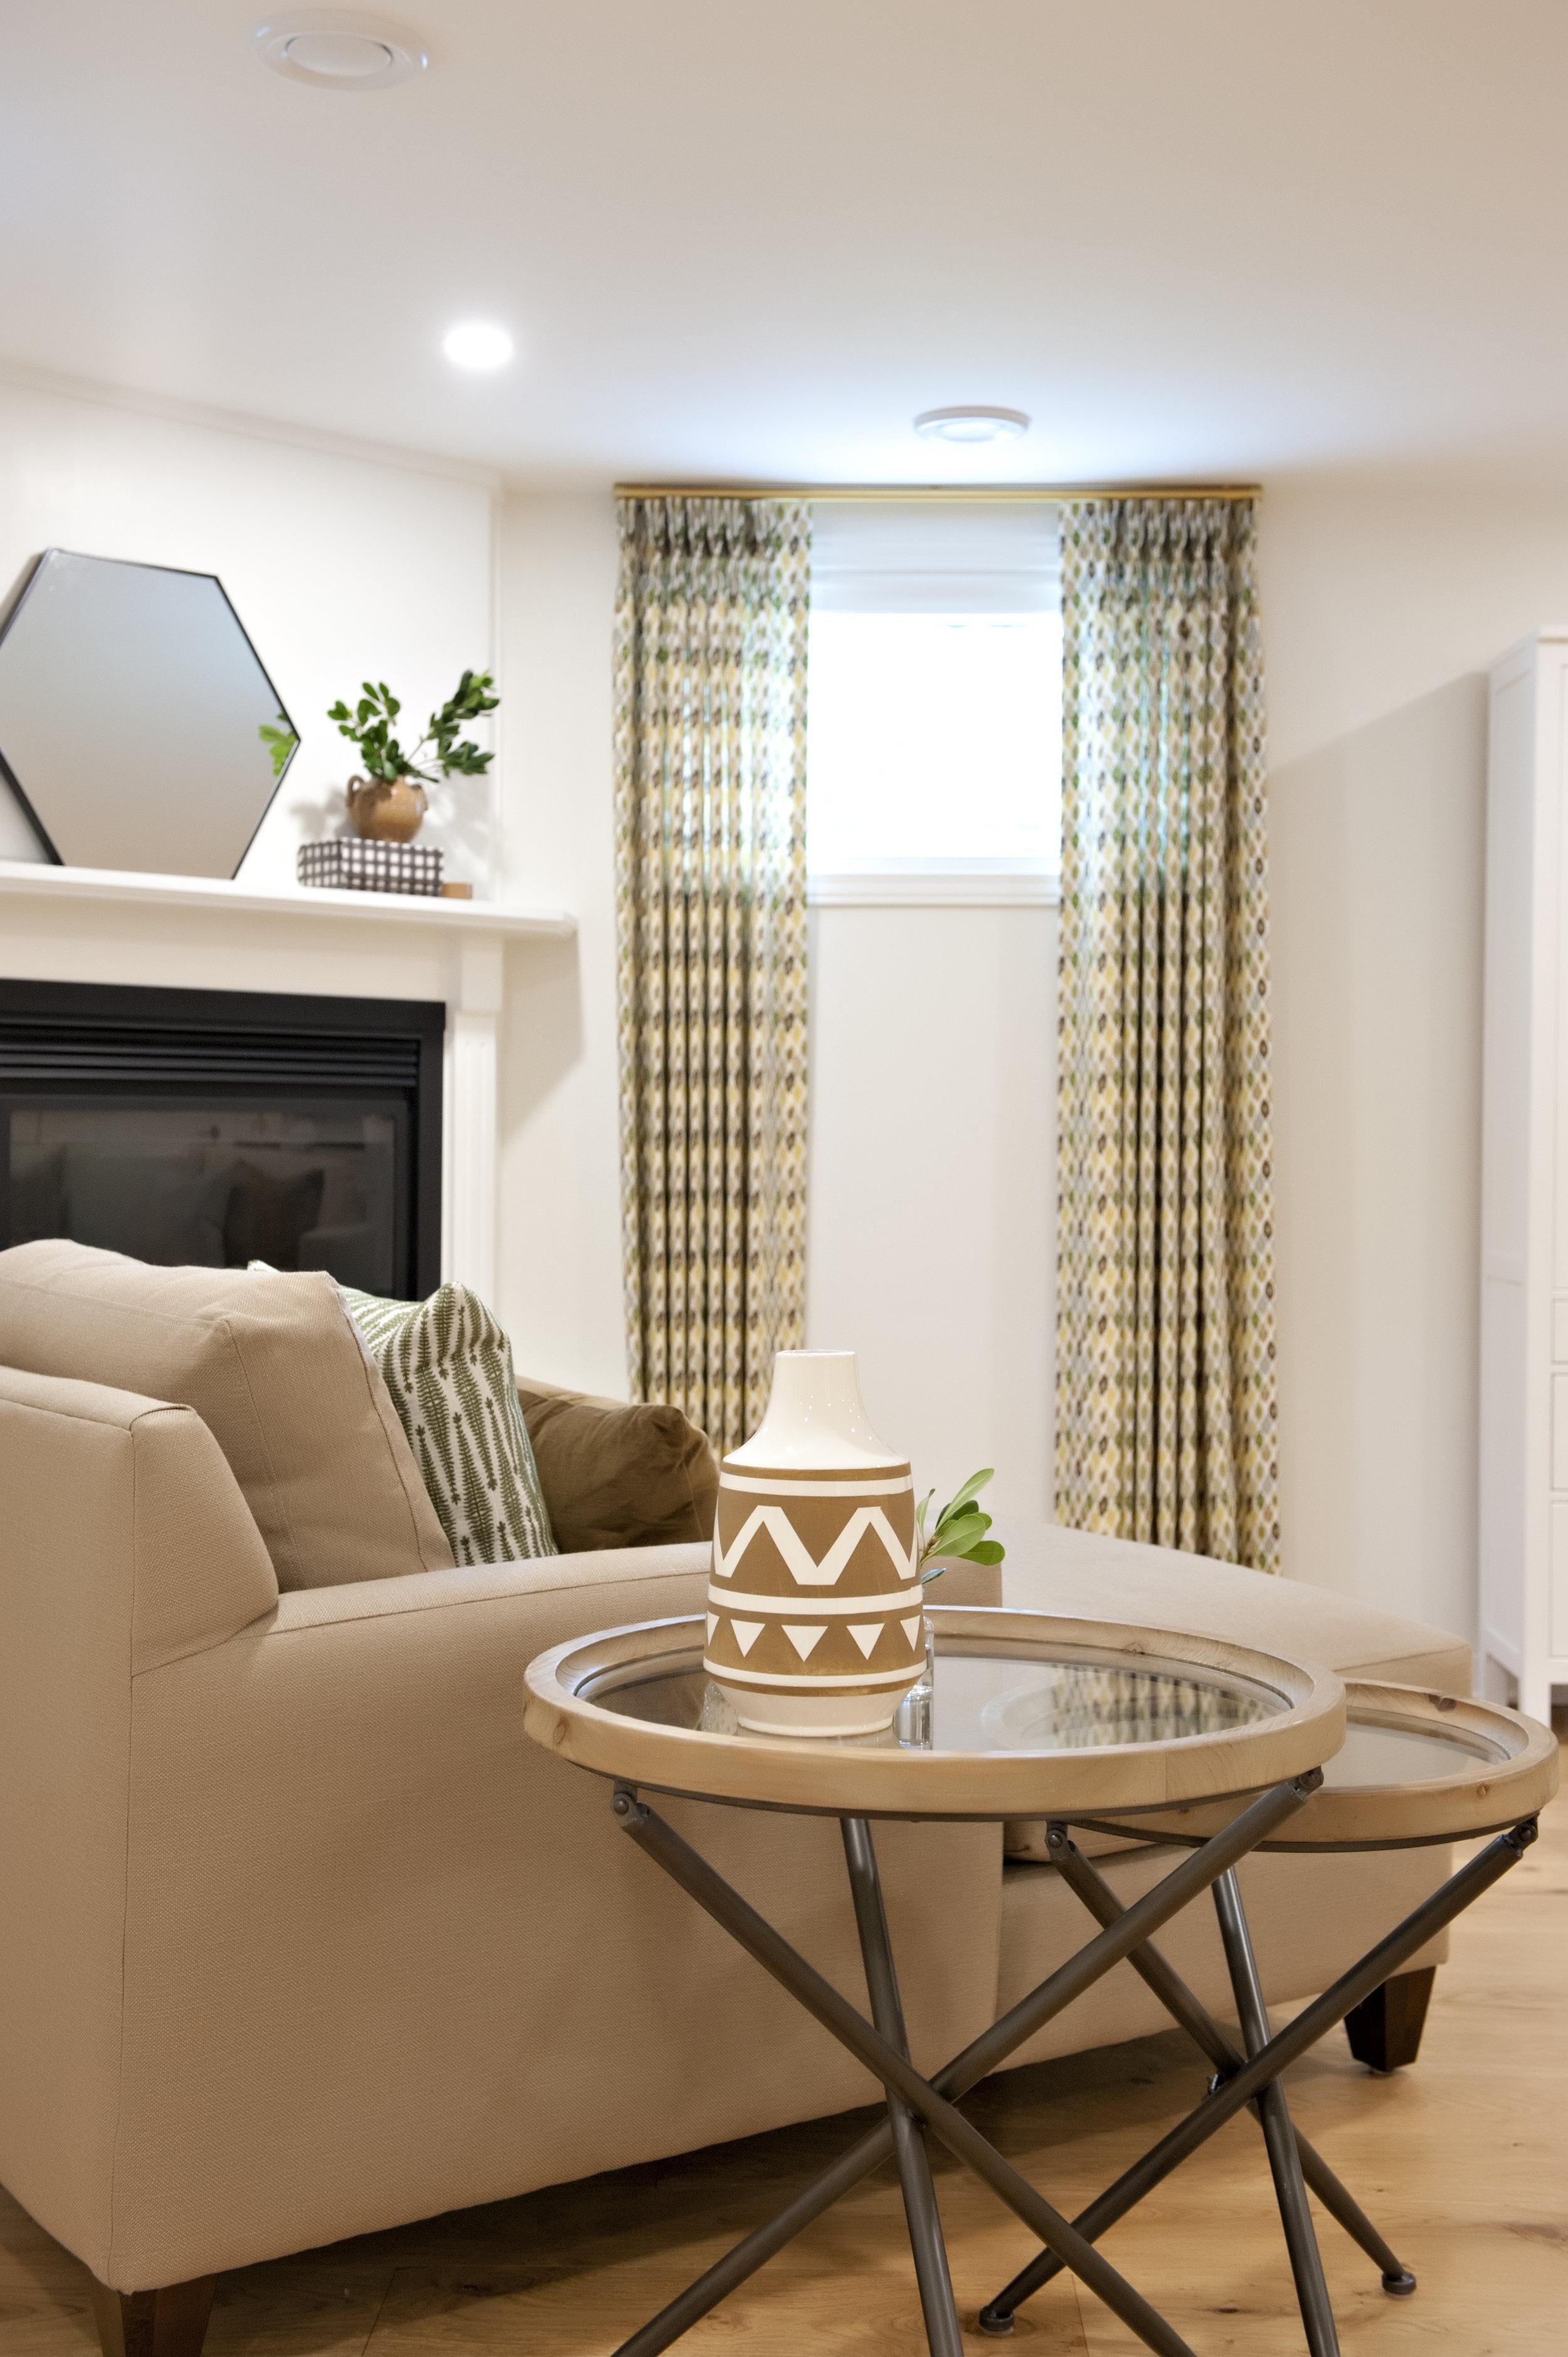 cedar-brae-basement-family-area-details